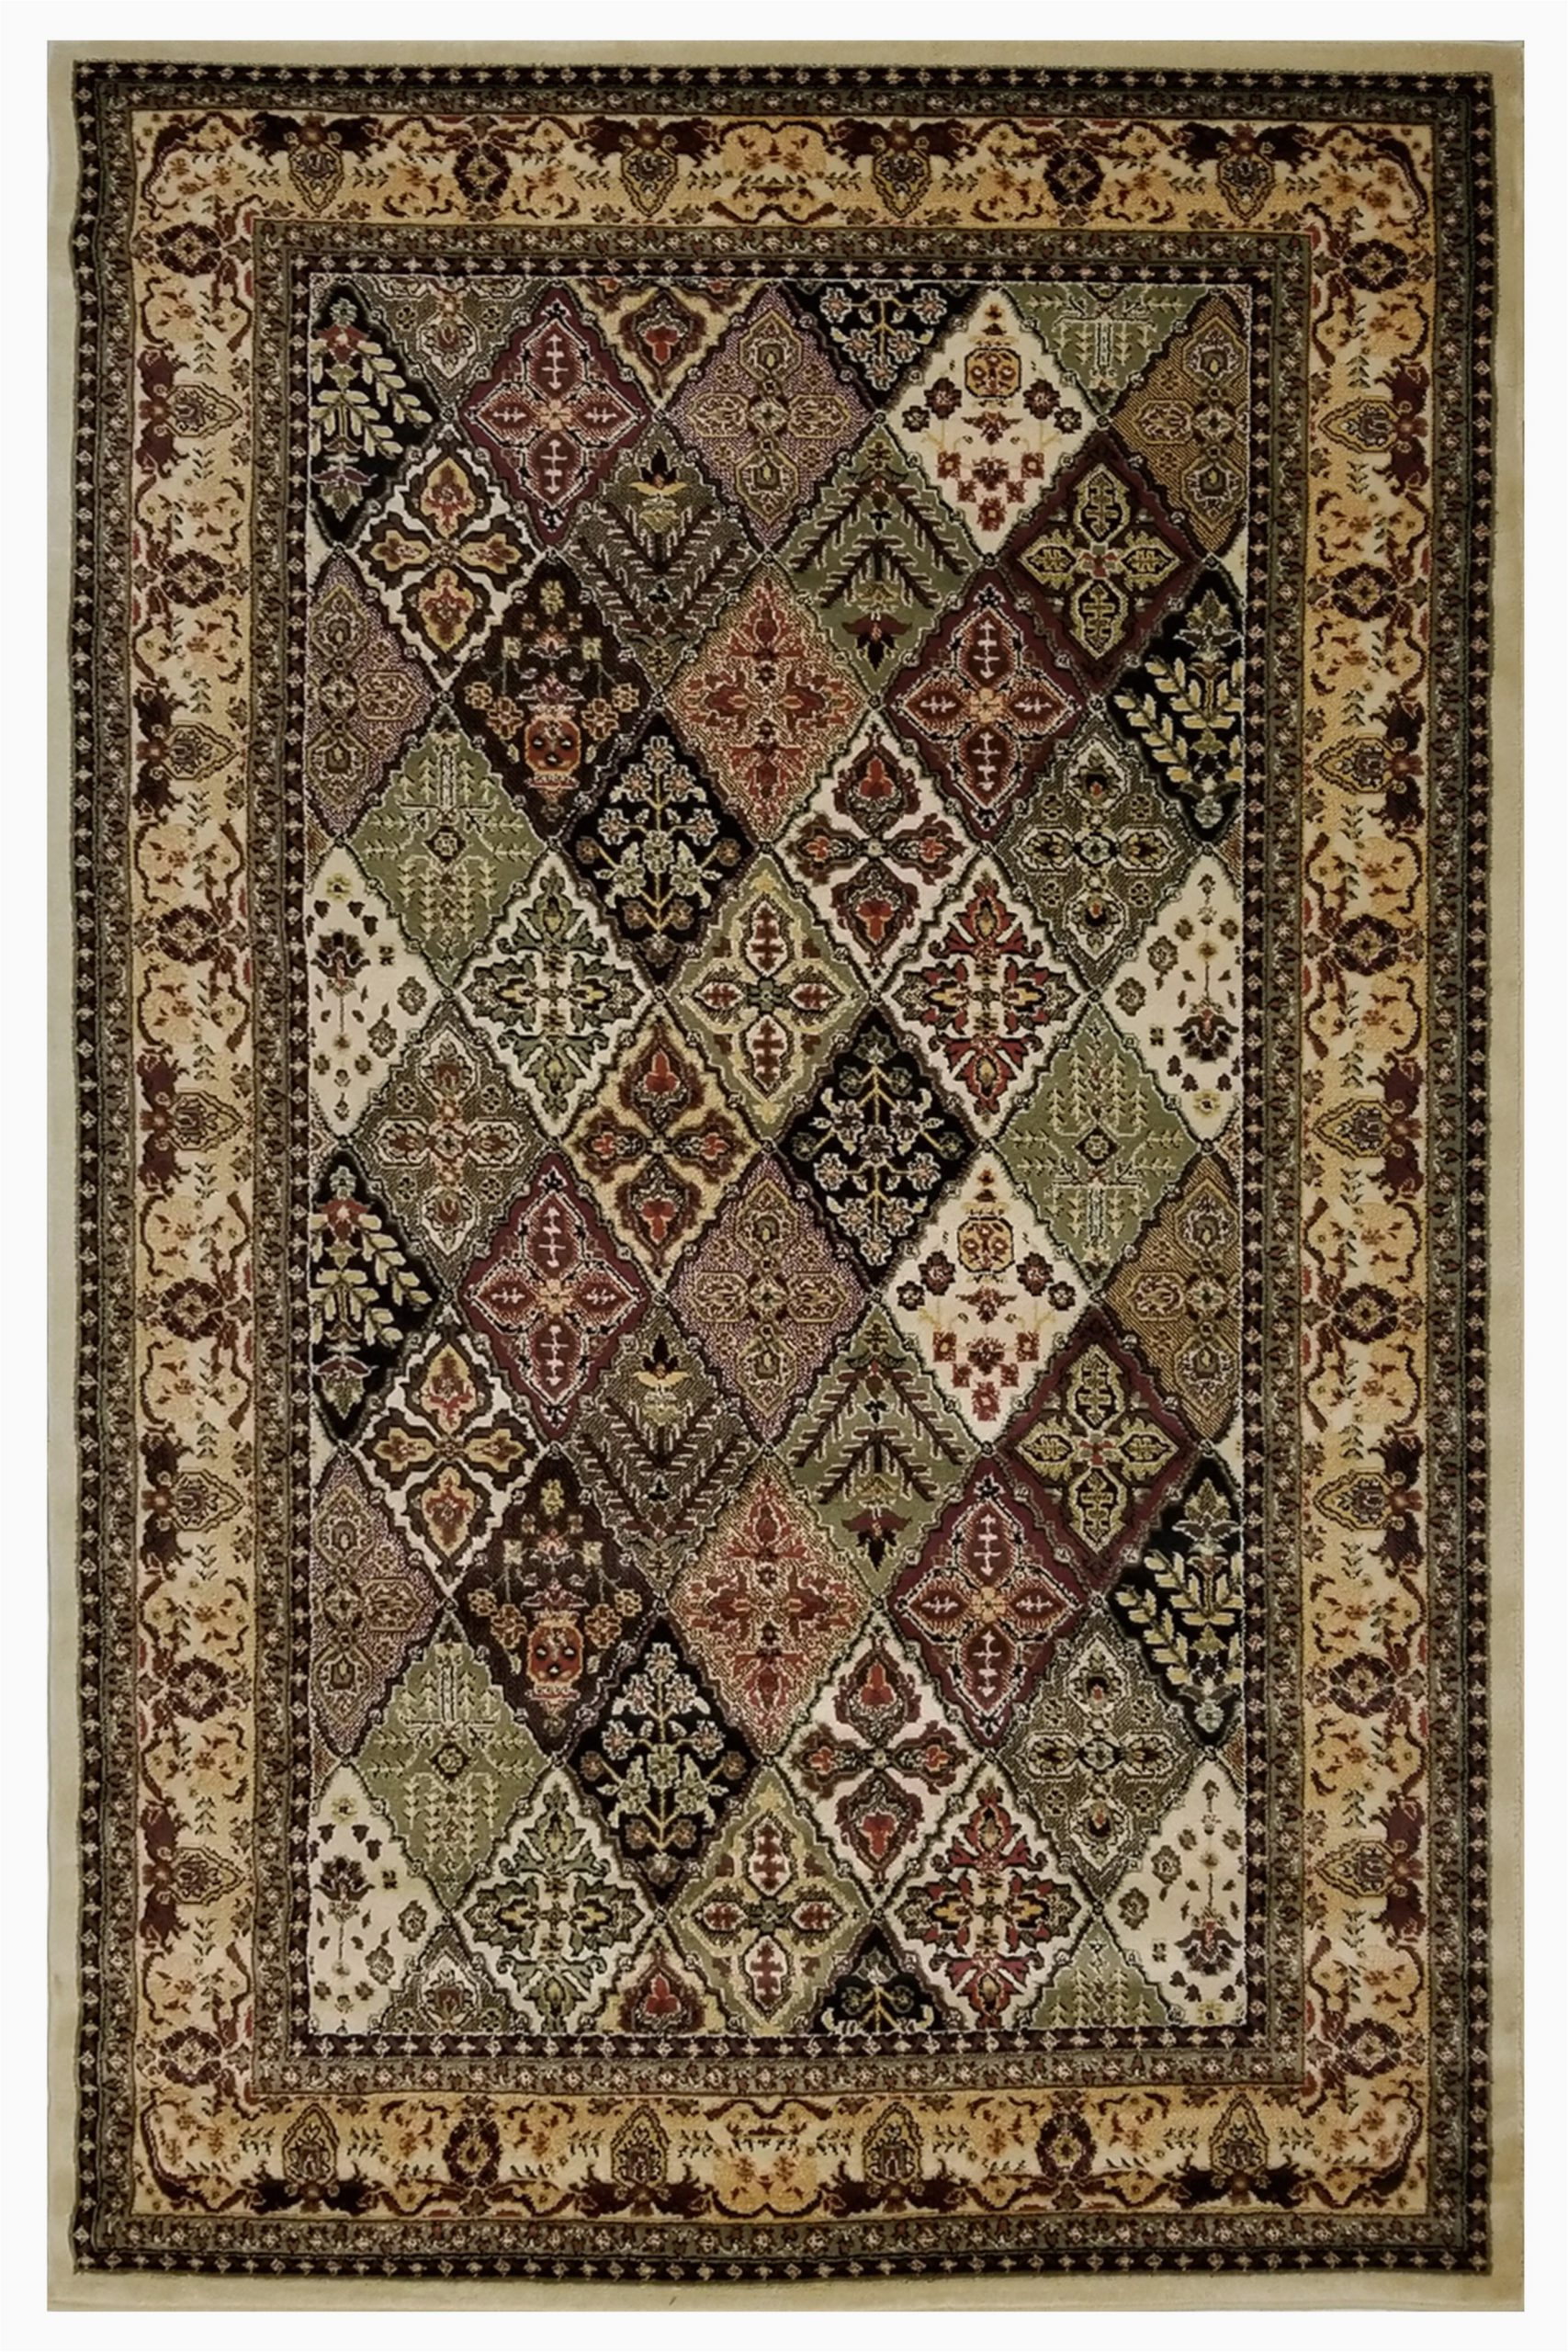 marrone beigegreenbrown area rug